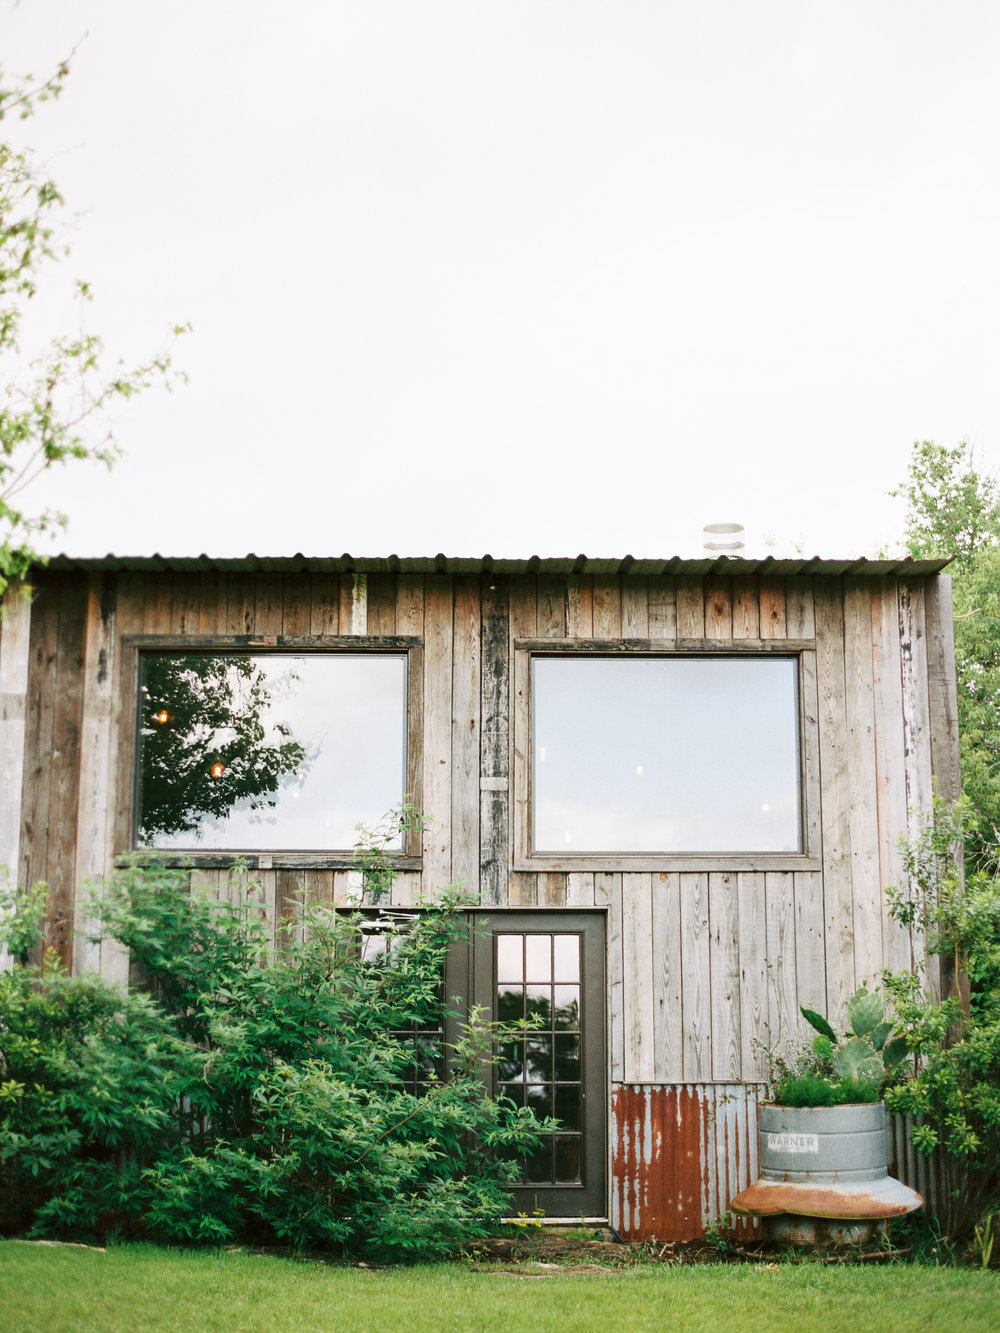 the-creek-haus-desintation-weekend-lodging-wedding-venue-austin-texas-hill-country